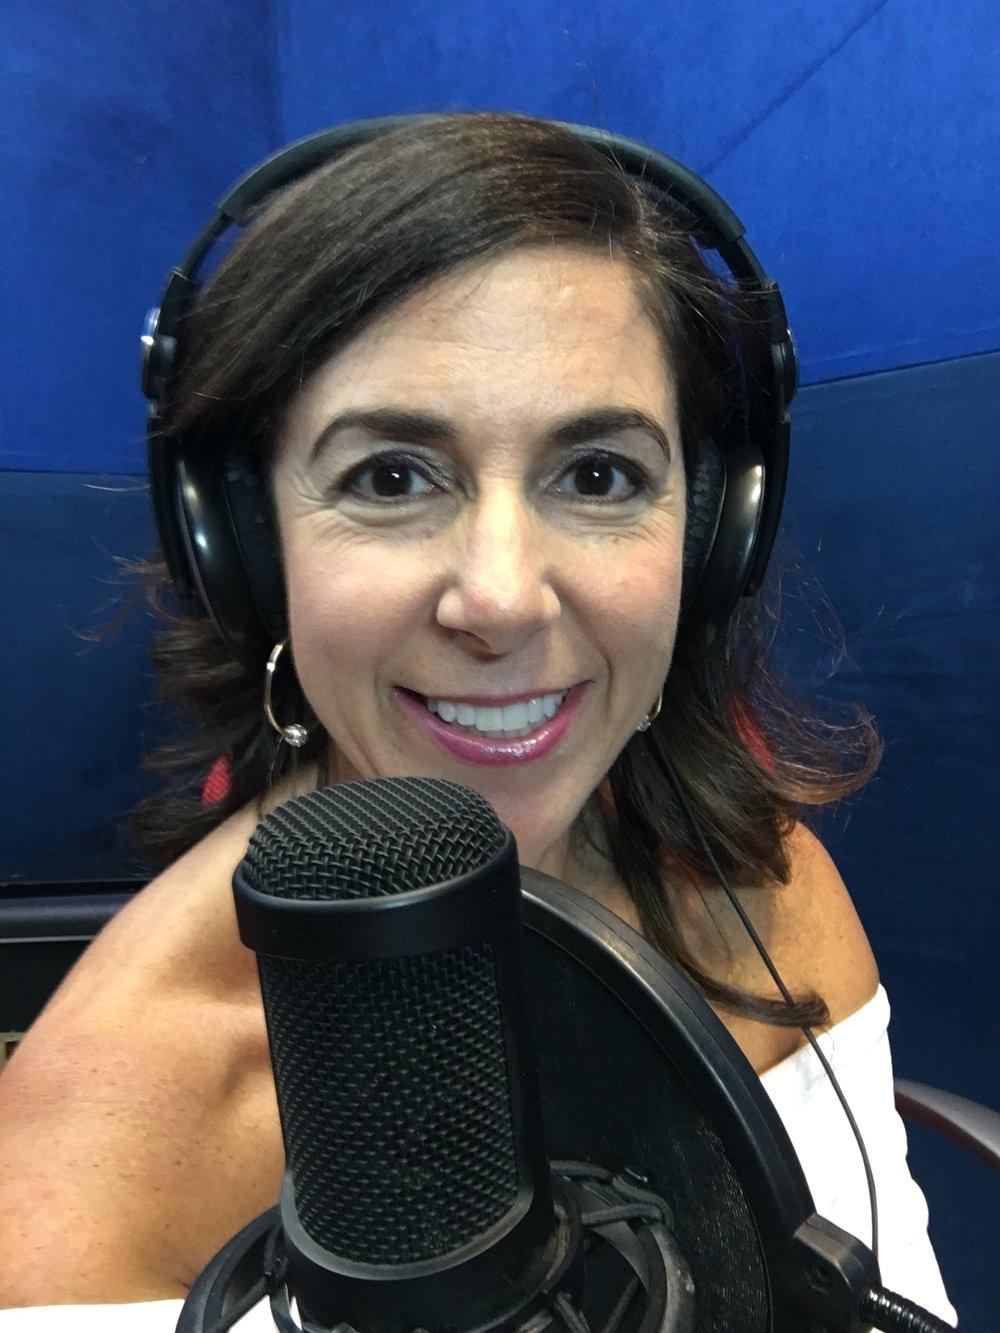 Kara Mayer Robinson recording Really Famous podcast with Jaime Camil